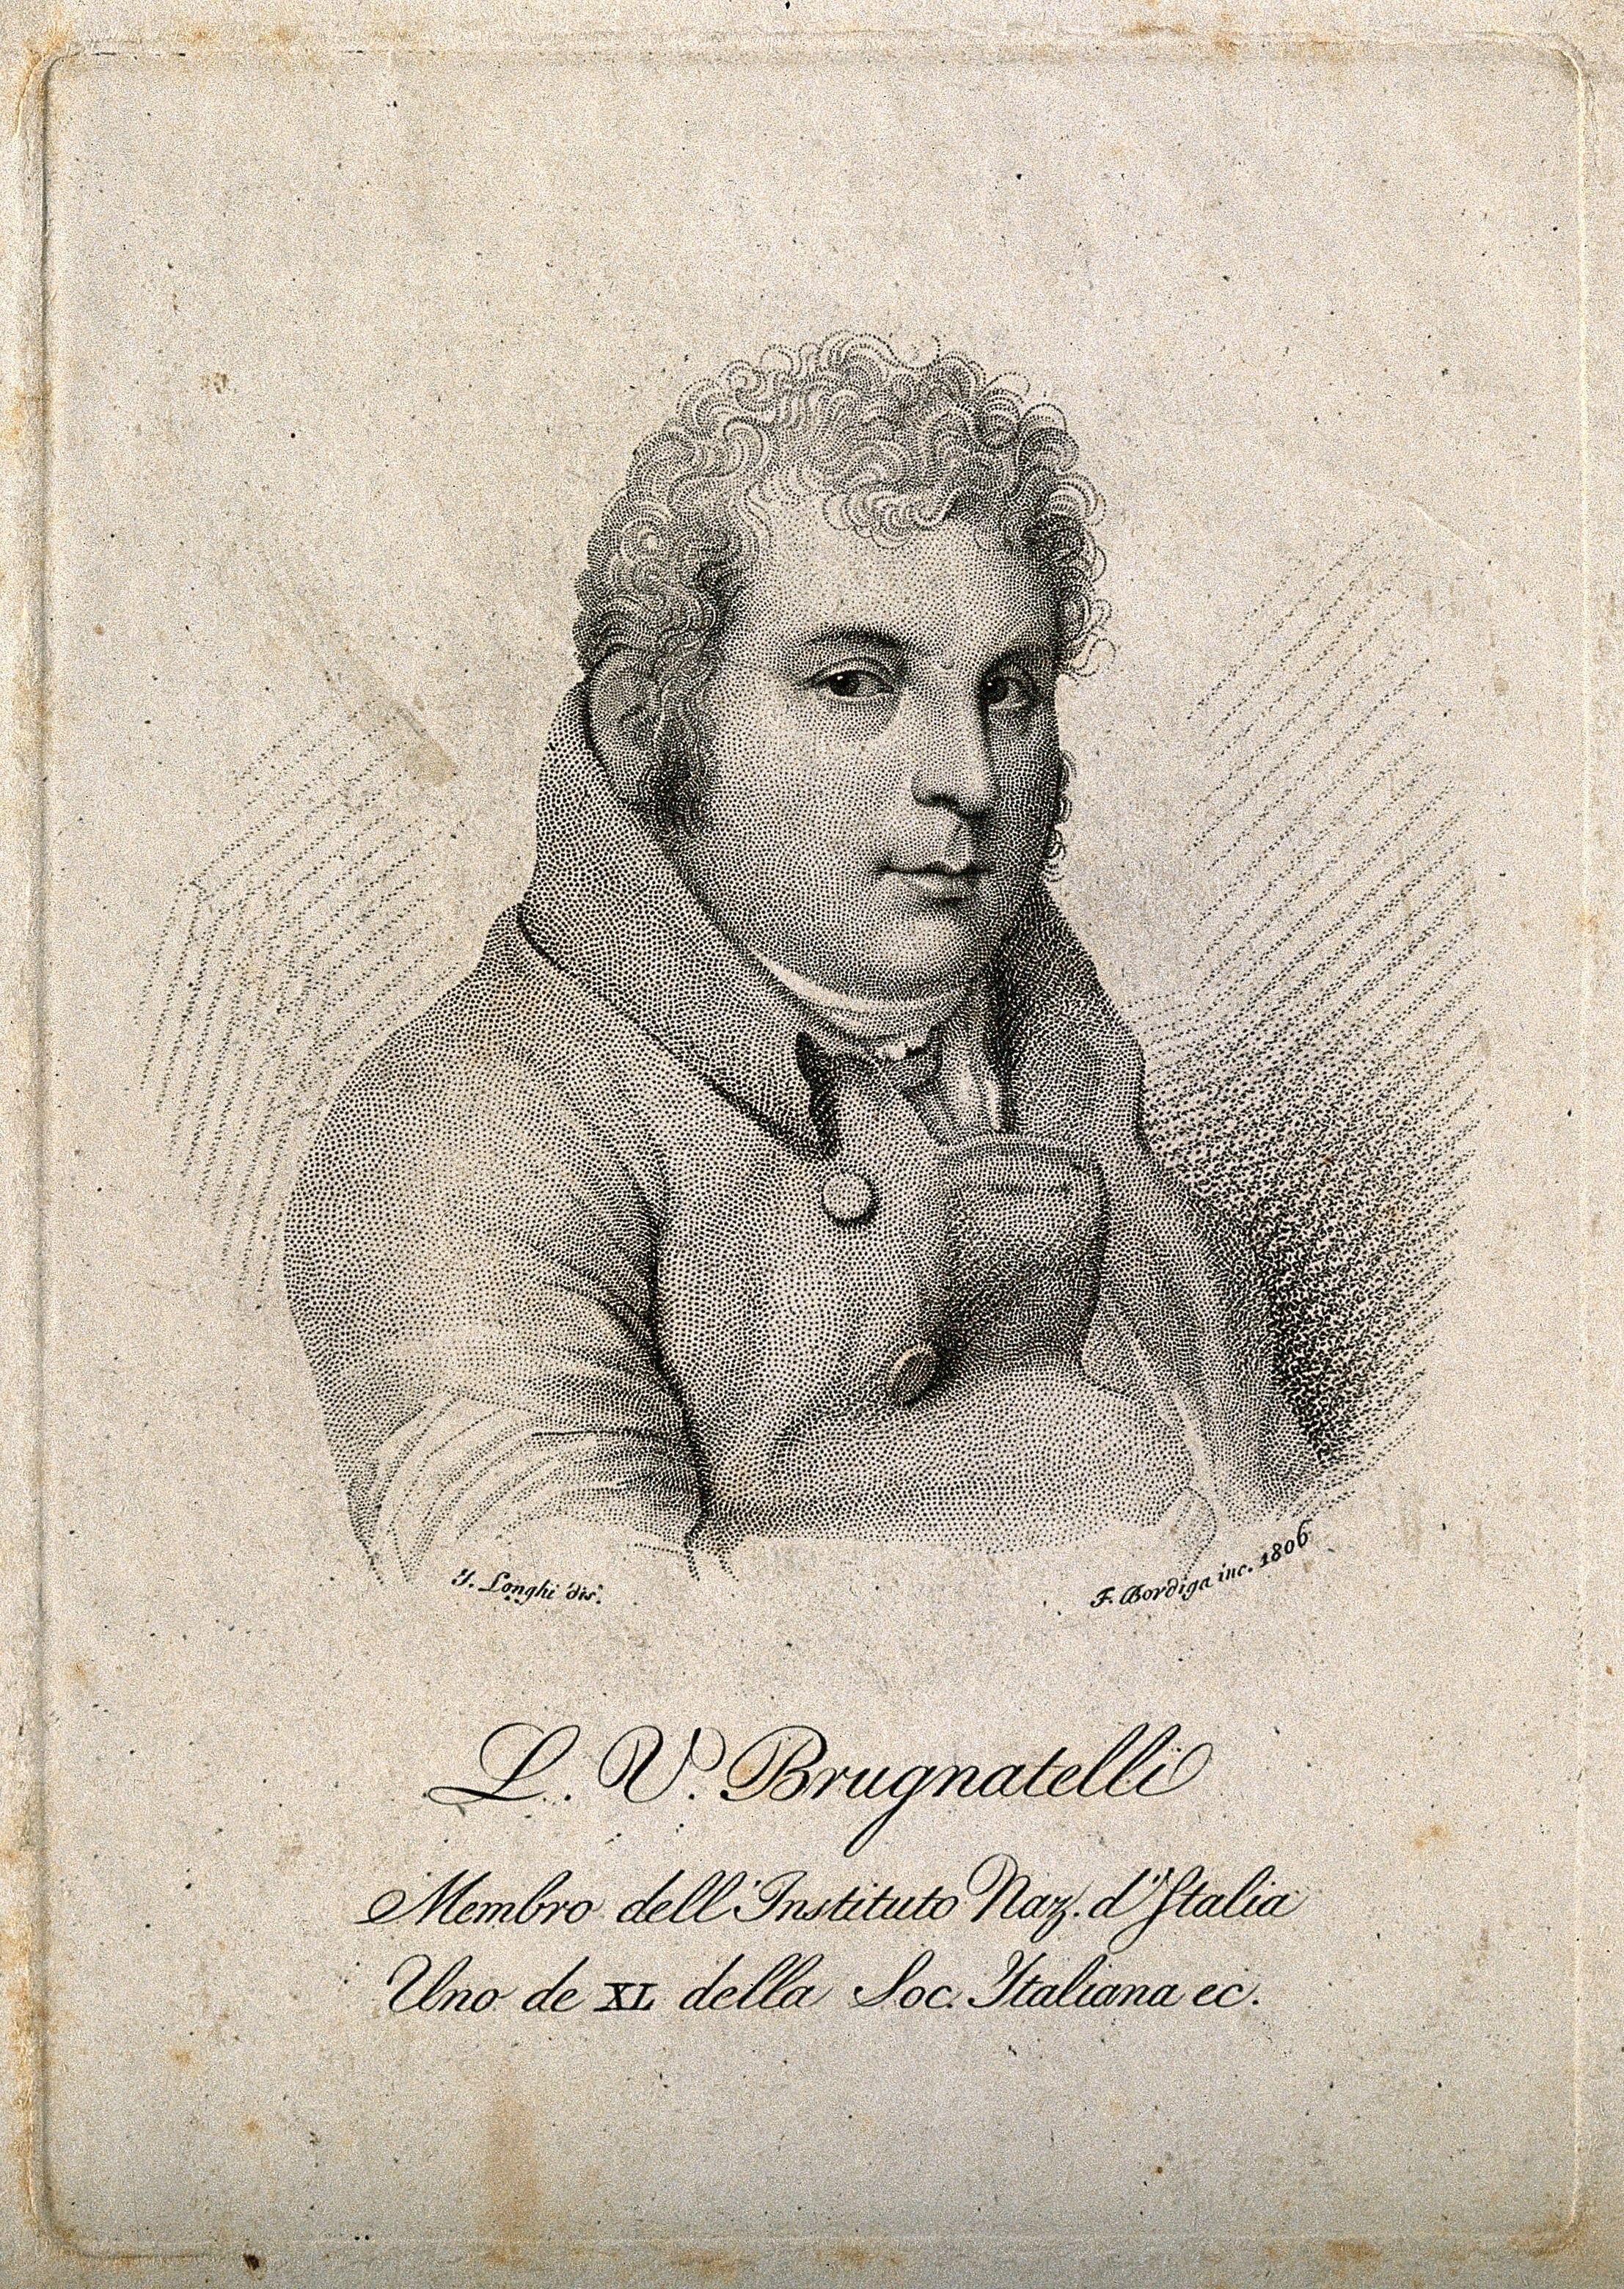 A print of Luigi Valentino Brugnatelli, the Italian inventor credited to inventing electroplating.